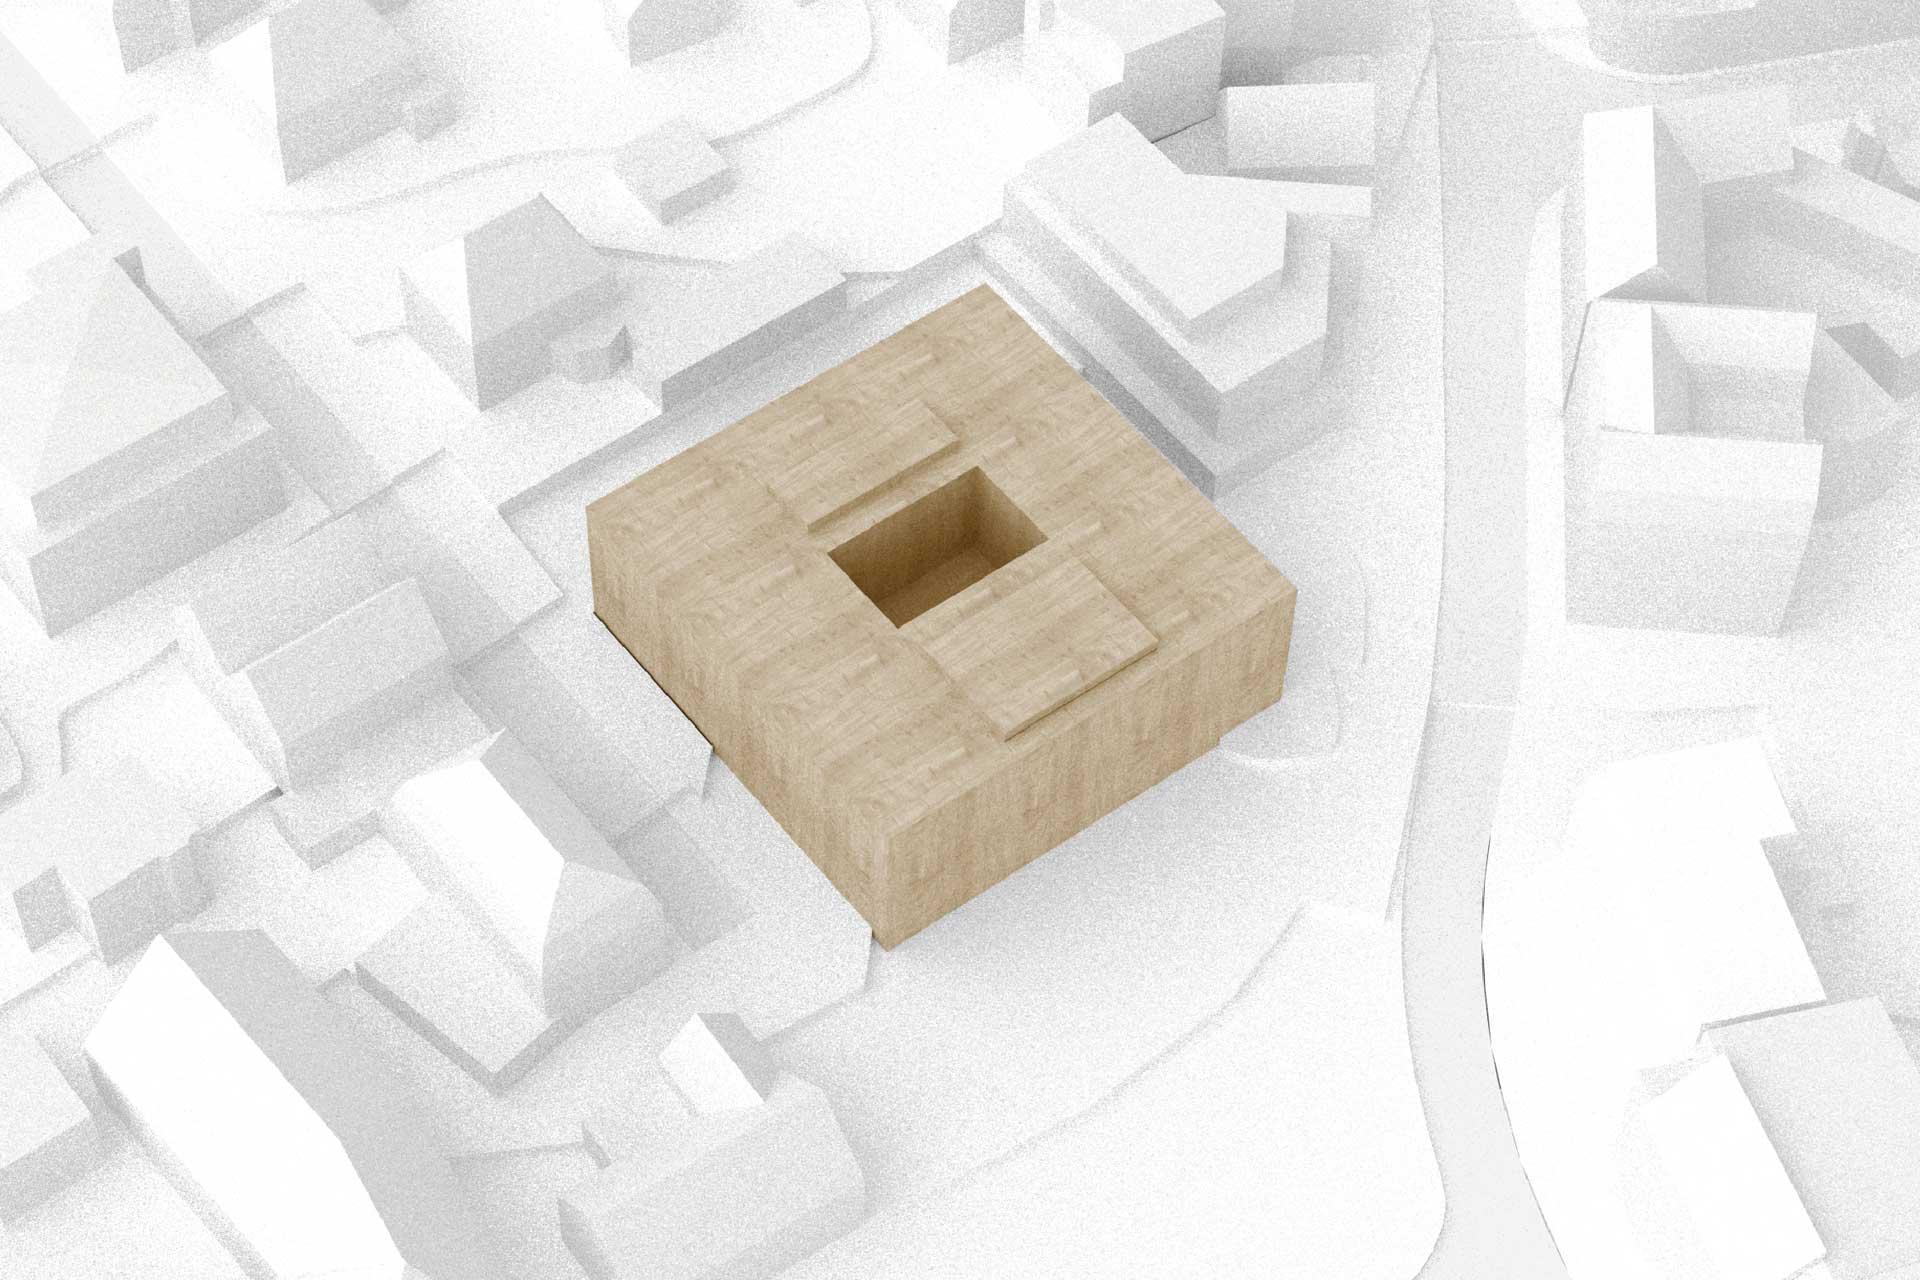 Modell Rathaus Laupheim